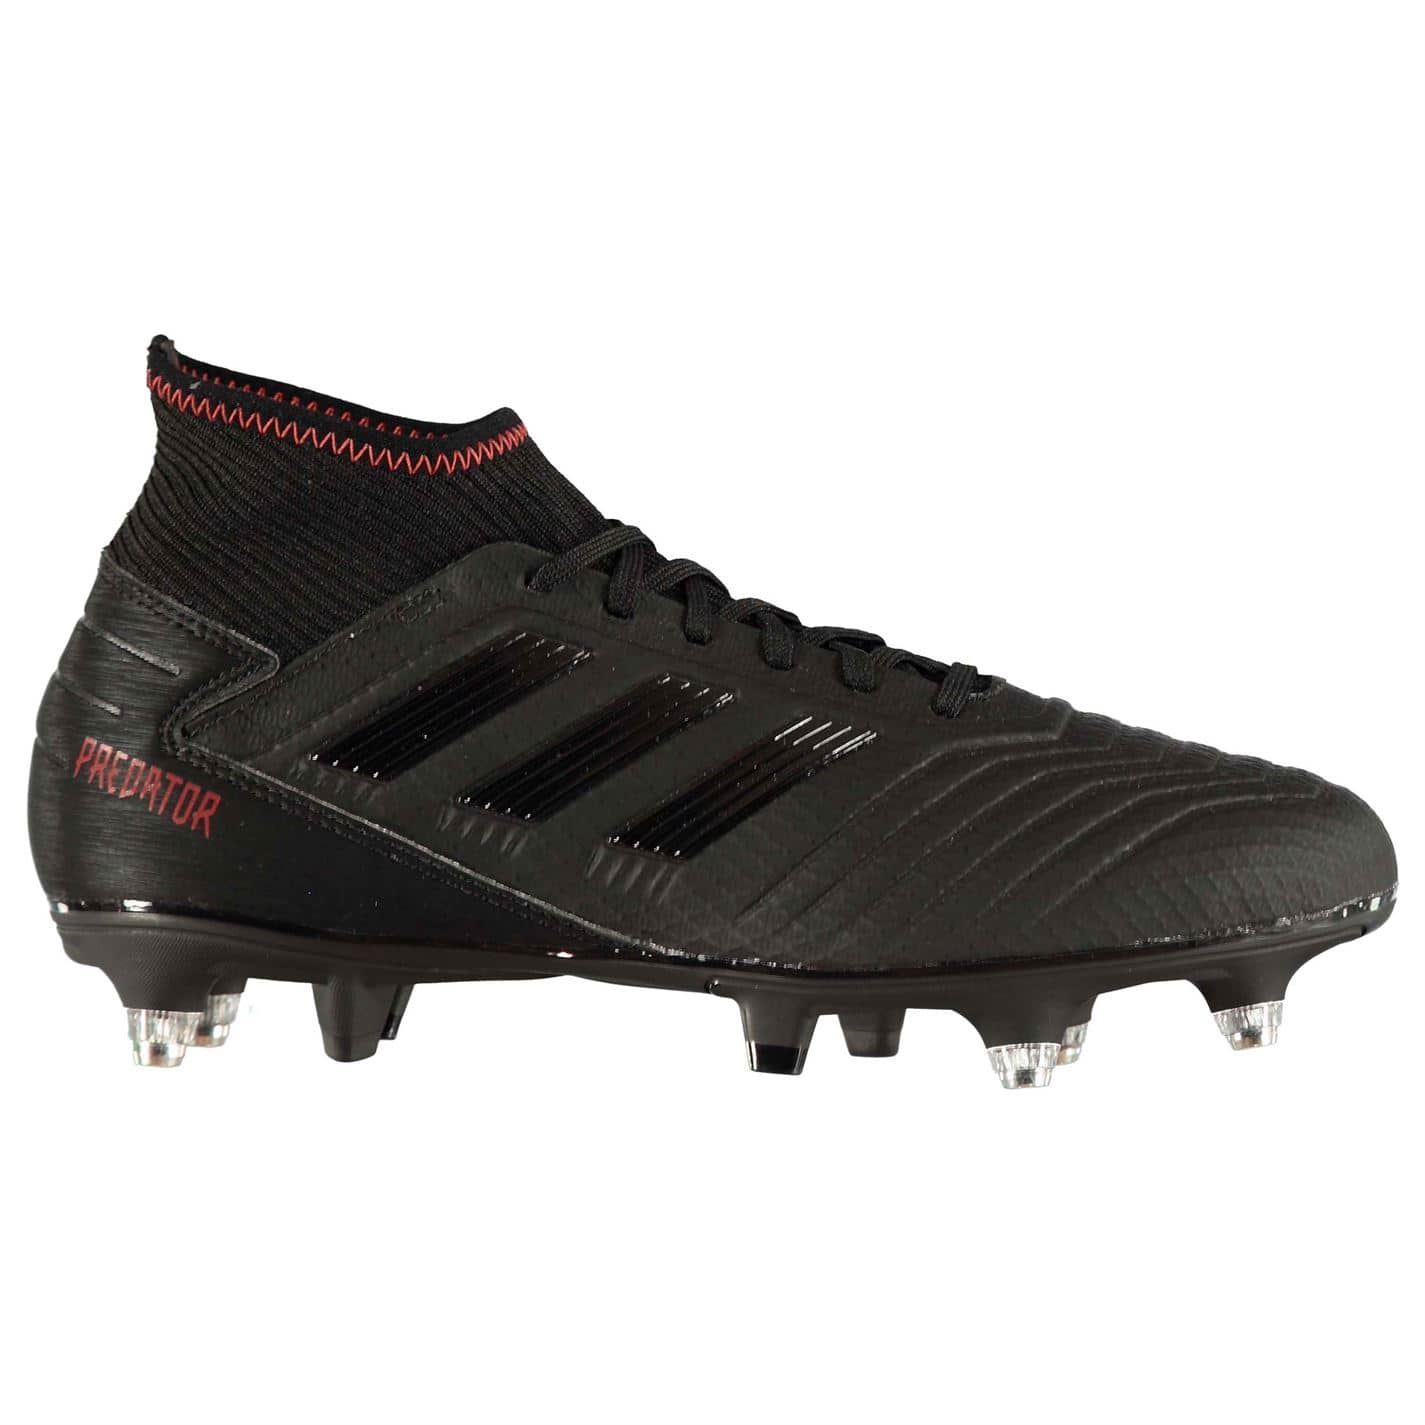 Detalles de Adidas Depredador 19.3 Botas de Fútbol Sg Negro Hombre SPORTS Zapatillas Adulto